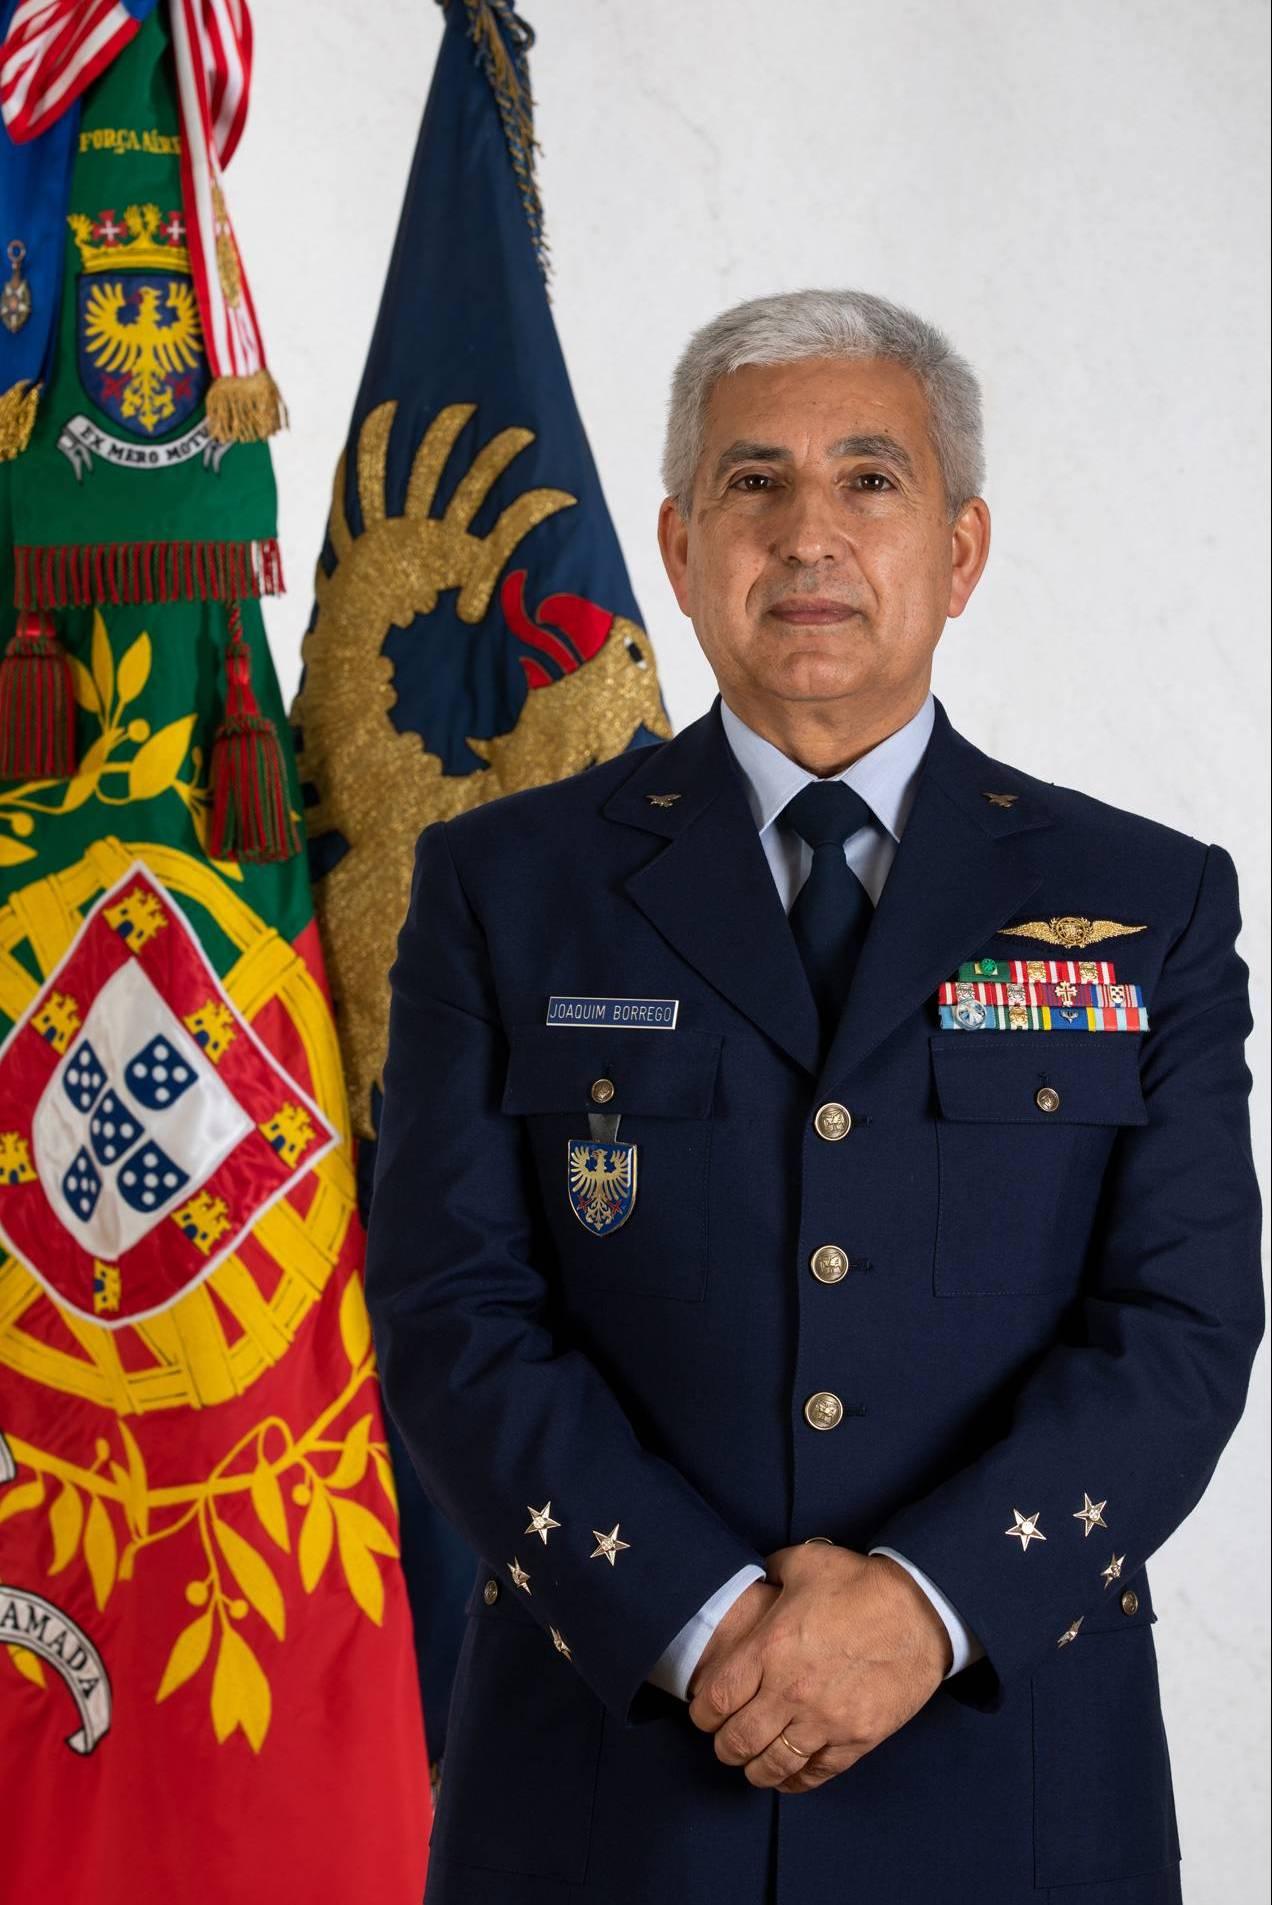 Tenente-general Joaquim Borrego, CEMFA